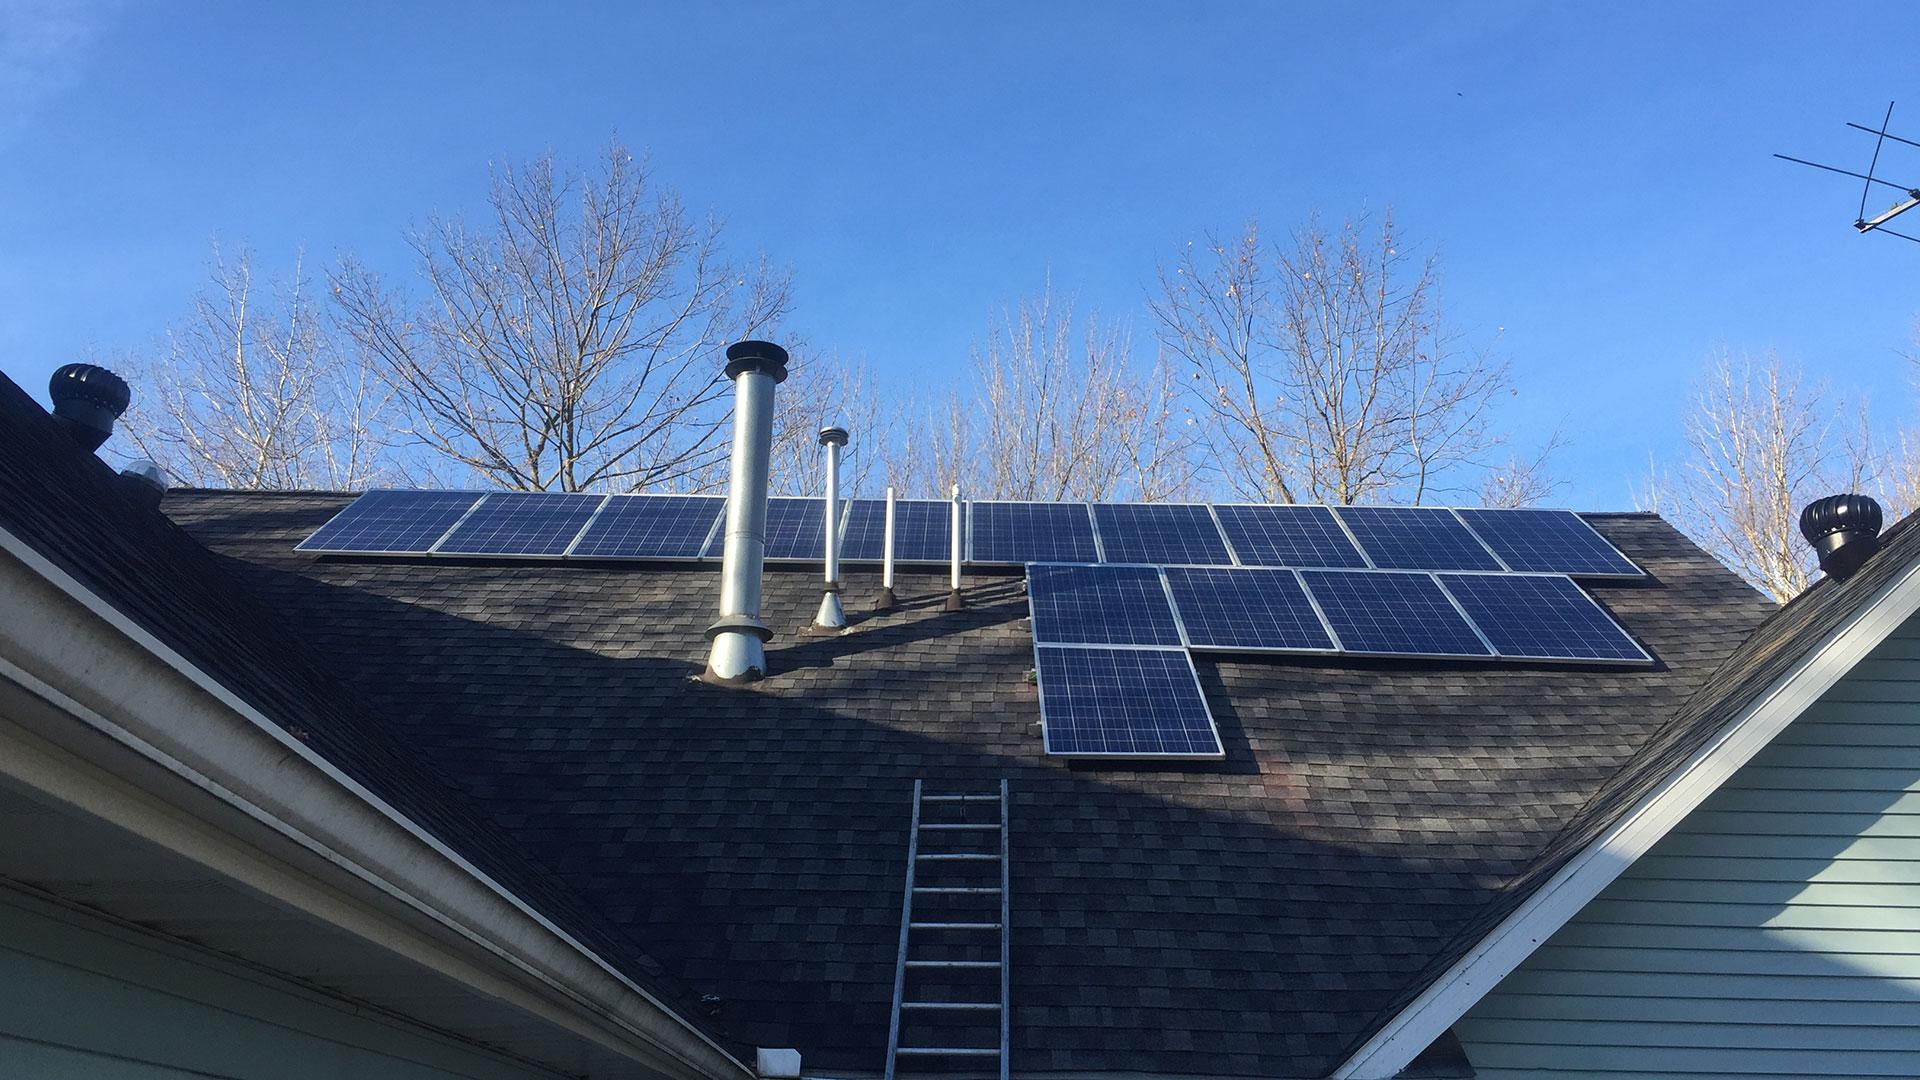 <!--googleoff: index-->Solar for Michigan<!--googleon: index--> Solar Panels, Solar Panel Installation and Solar Inspection